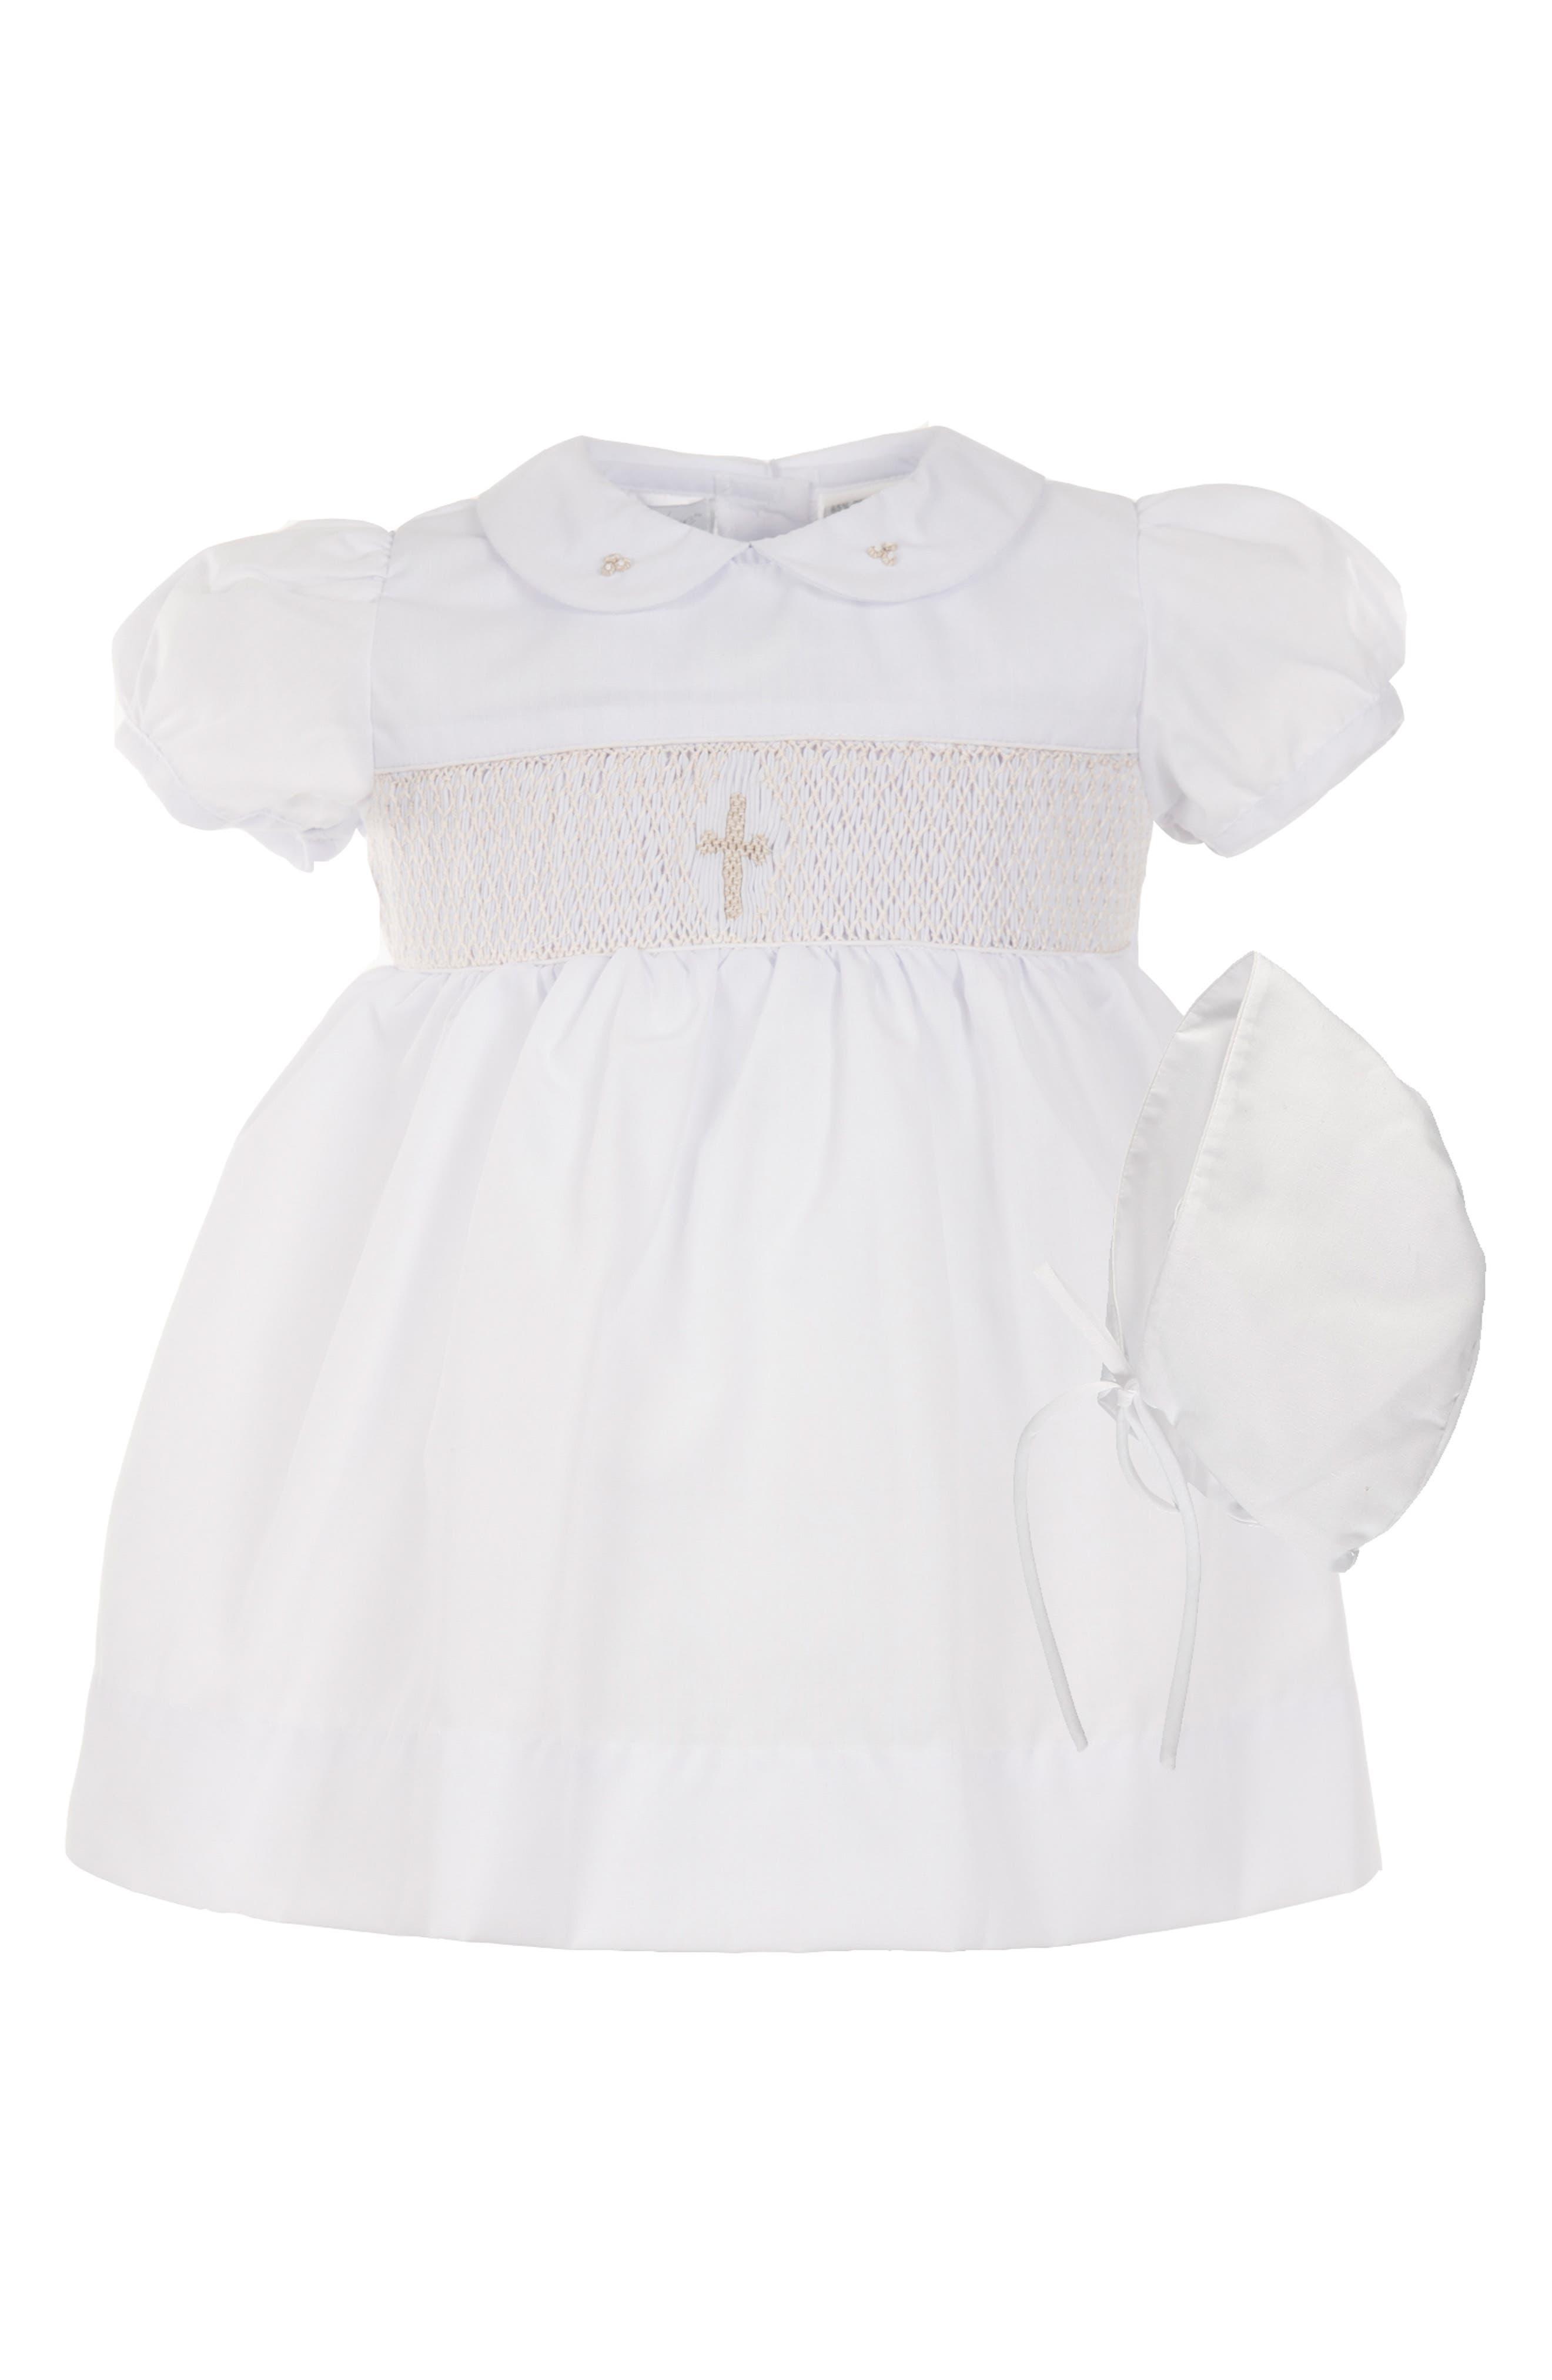 CARRIAGE BOUTIQUE, Smocked Inset Christening Gown & Bonnet Set, Main thumbnail 1, color, 100